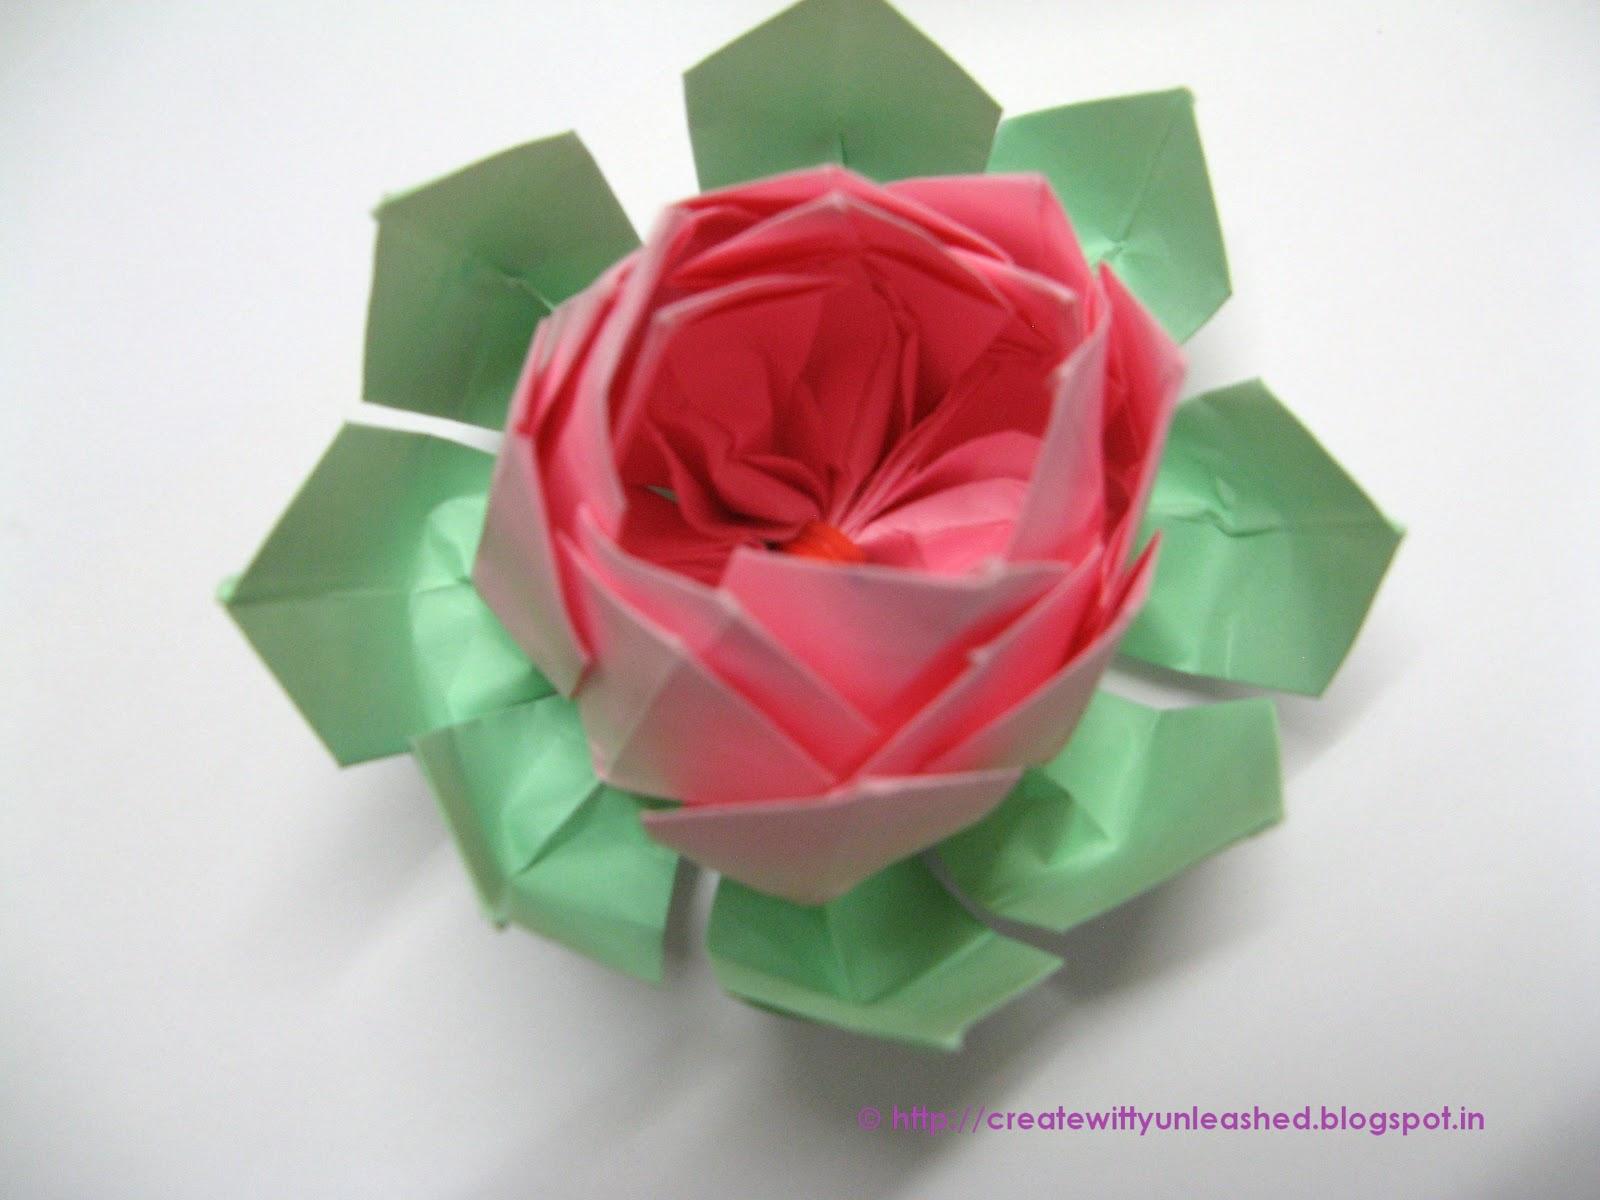 3 Ways to Make Modular Origami - wikiHow | 1200x1600